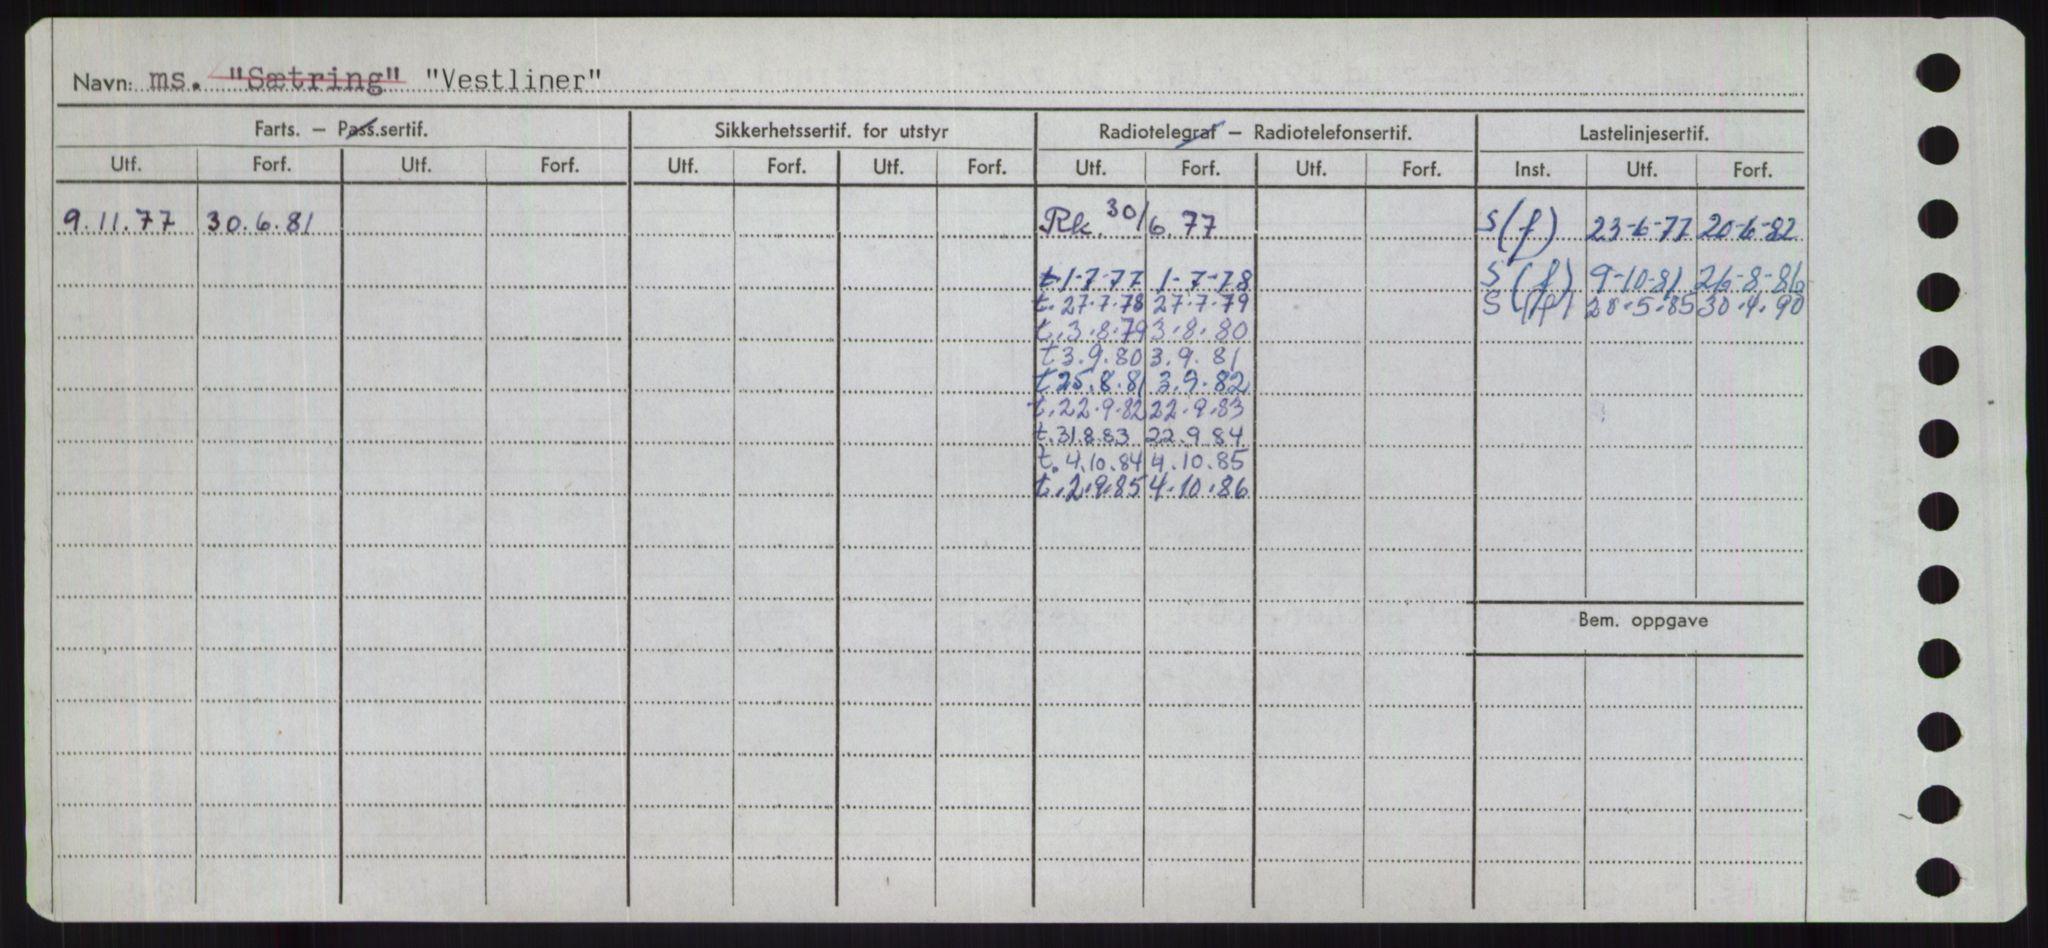 RA, Sjøfartsdirektoratet med forløpere, Skipsmålingen, H/Ha/L0006: Fartøy, Sver-Å, p. 344